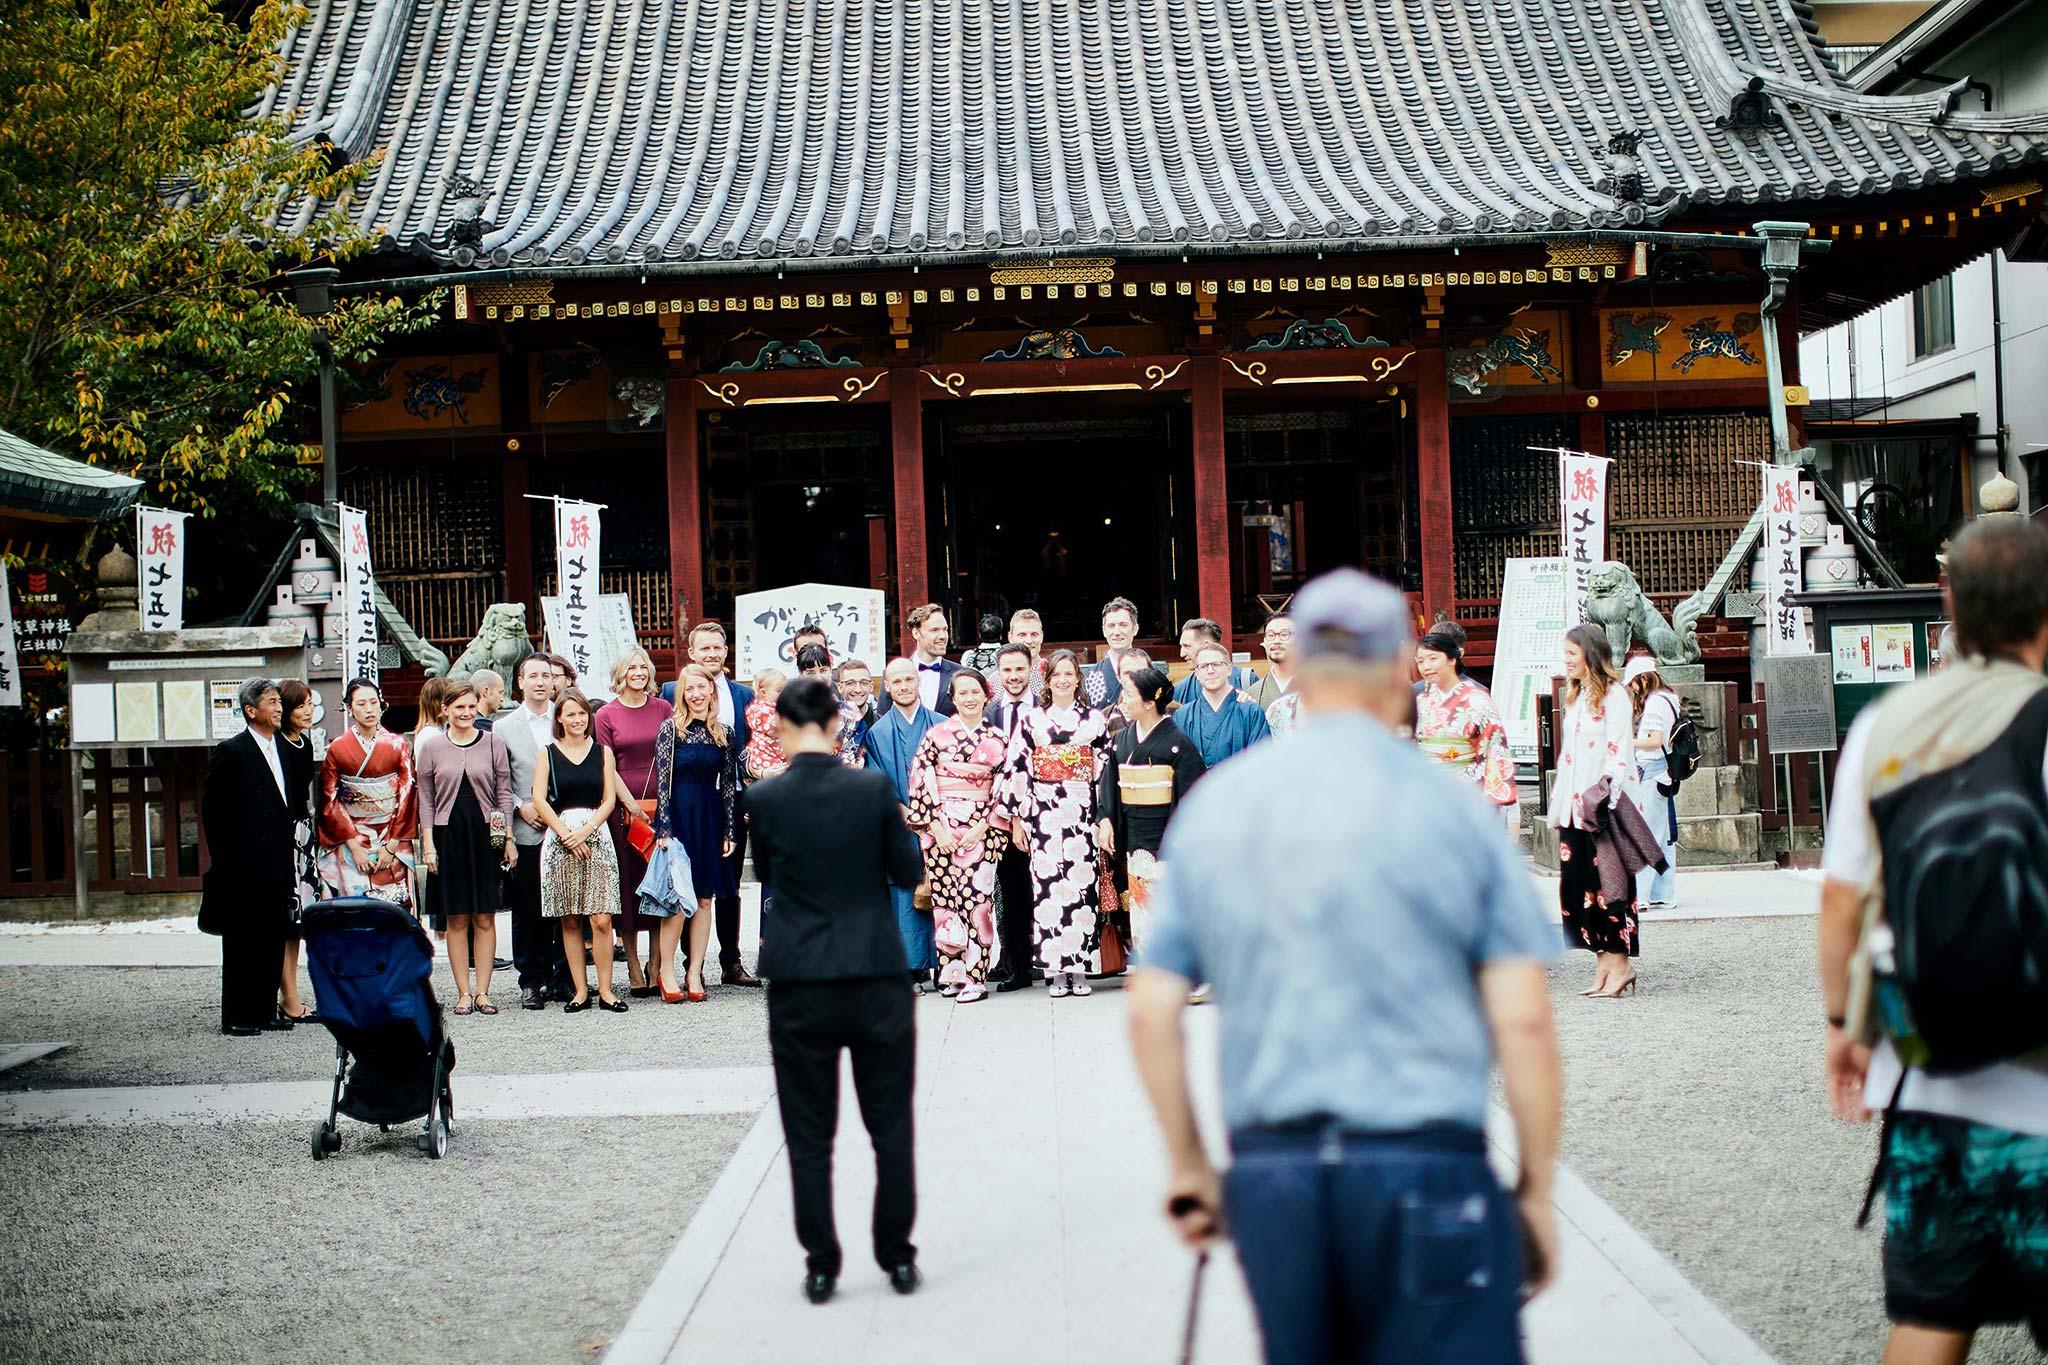 tokyo asakusa shrine traditional wedding guest group photo